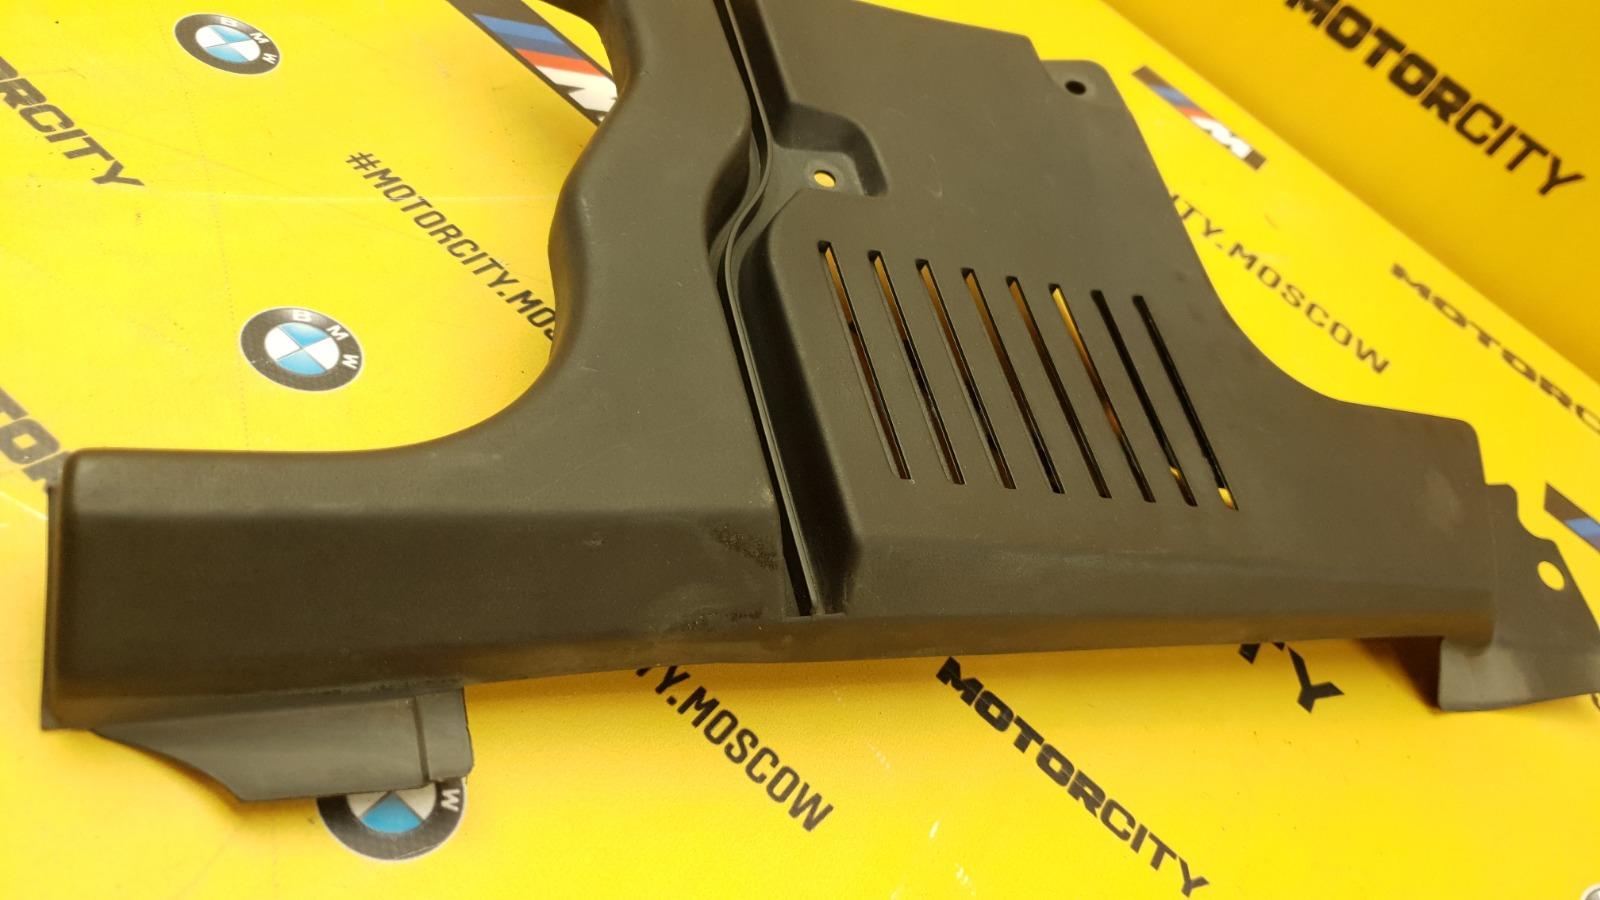 Накладка подкапотная передняя правая 1997 W140 M104.994 3.2